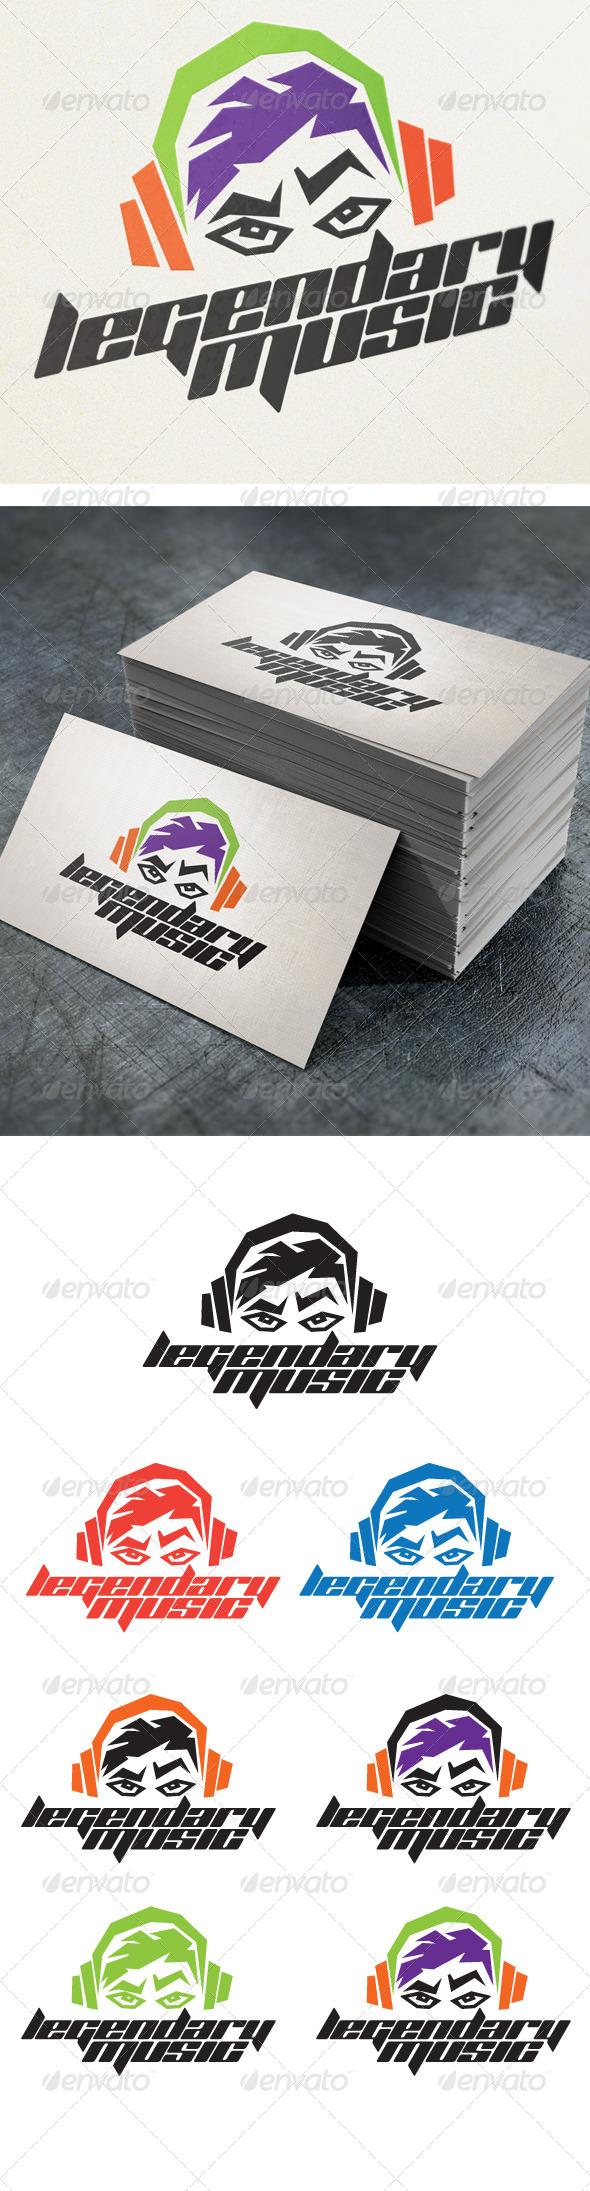 GraphicRiver Legendary Music 4521418